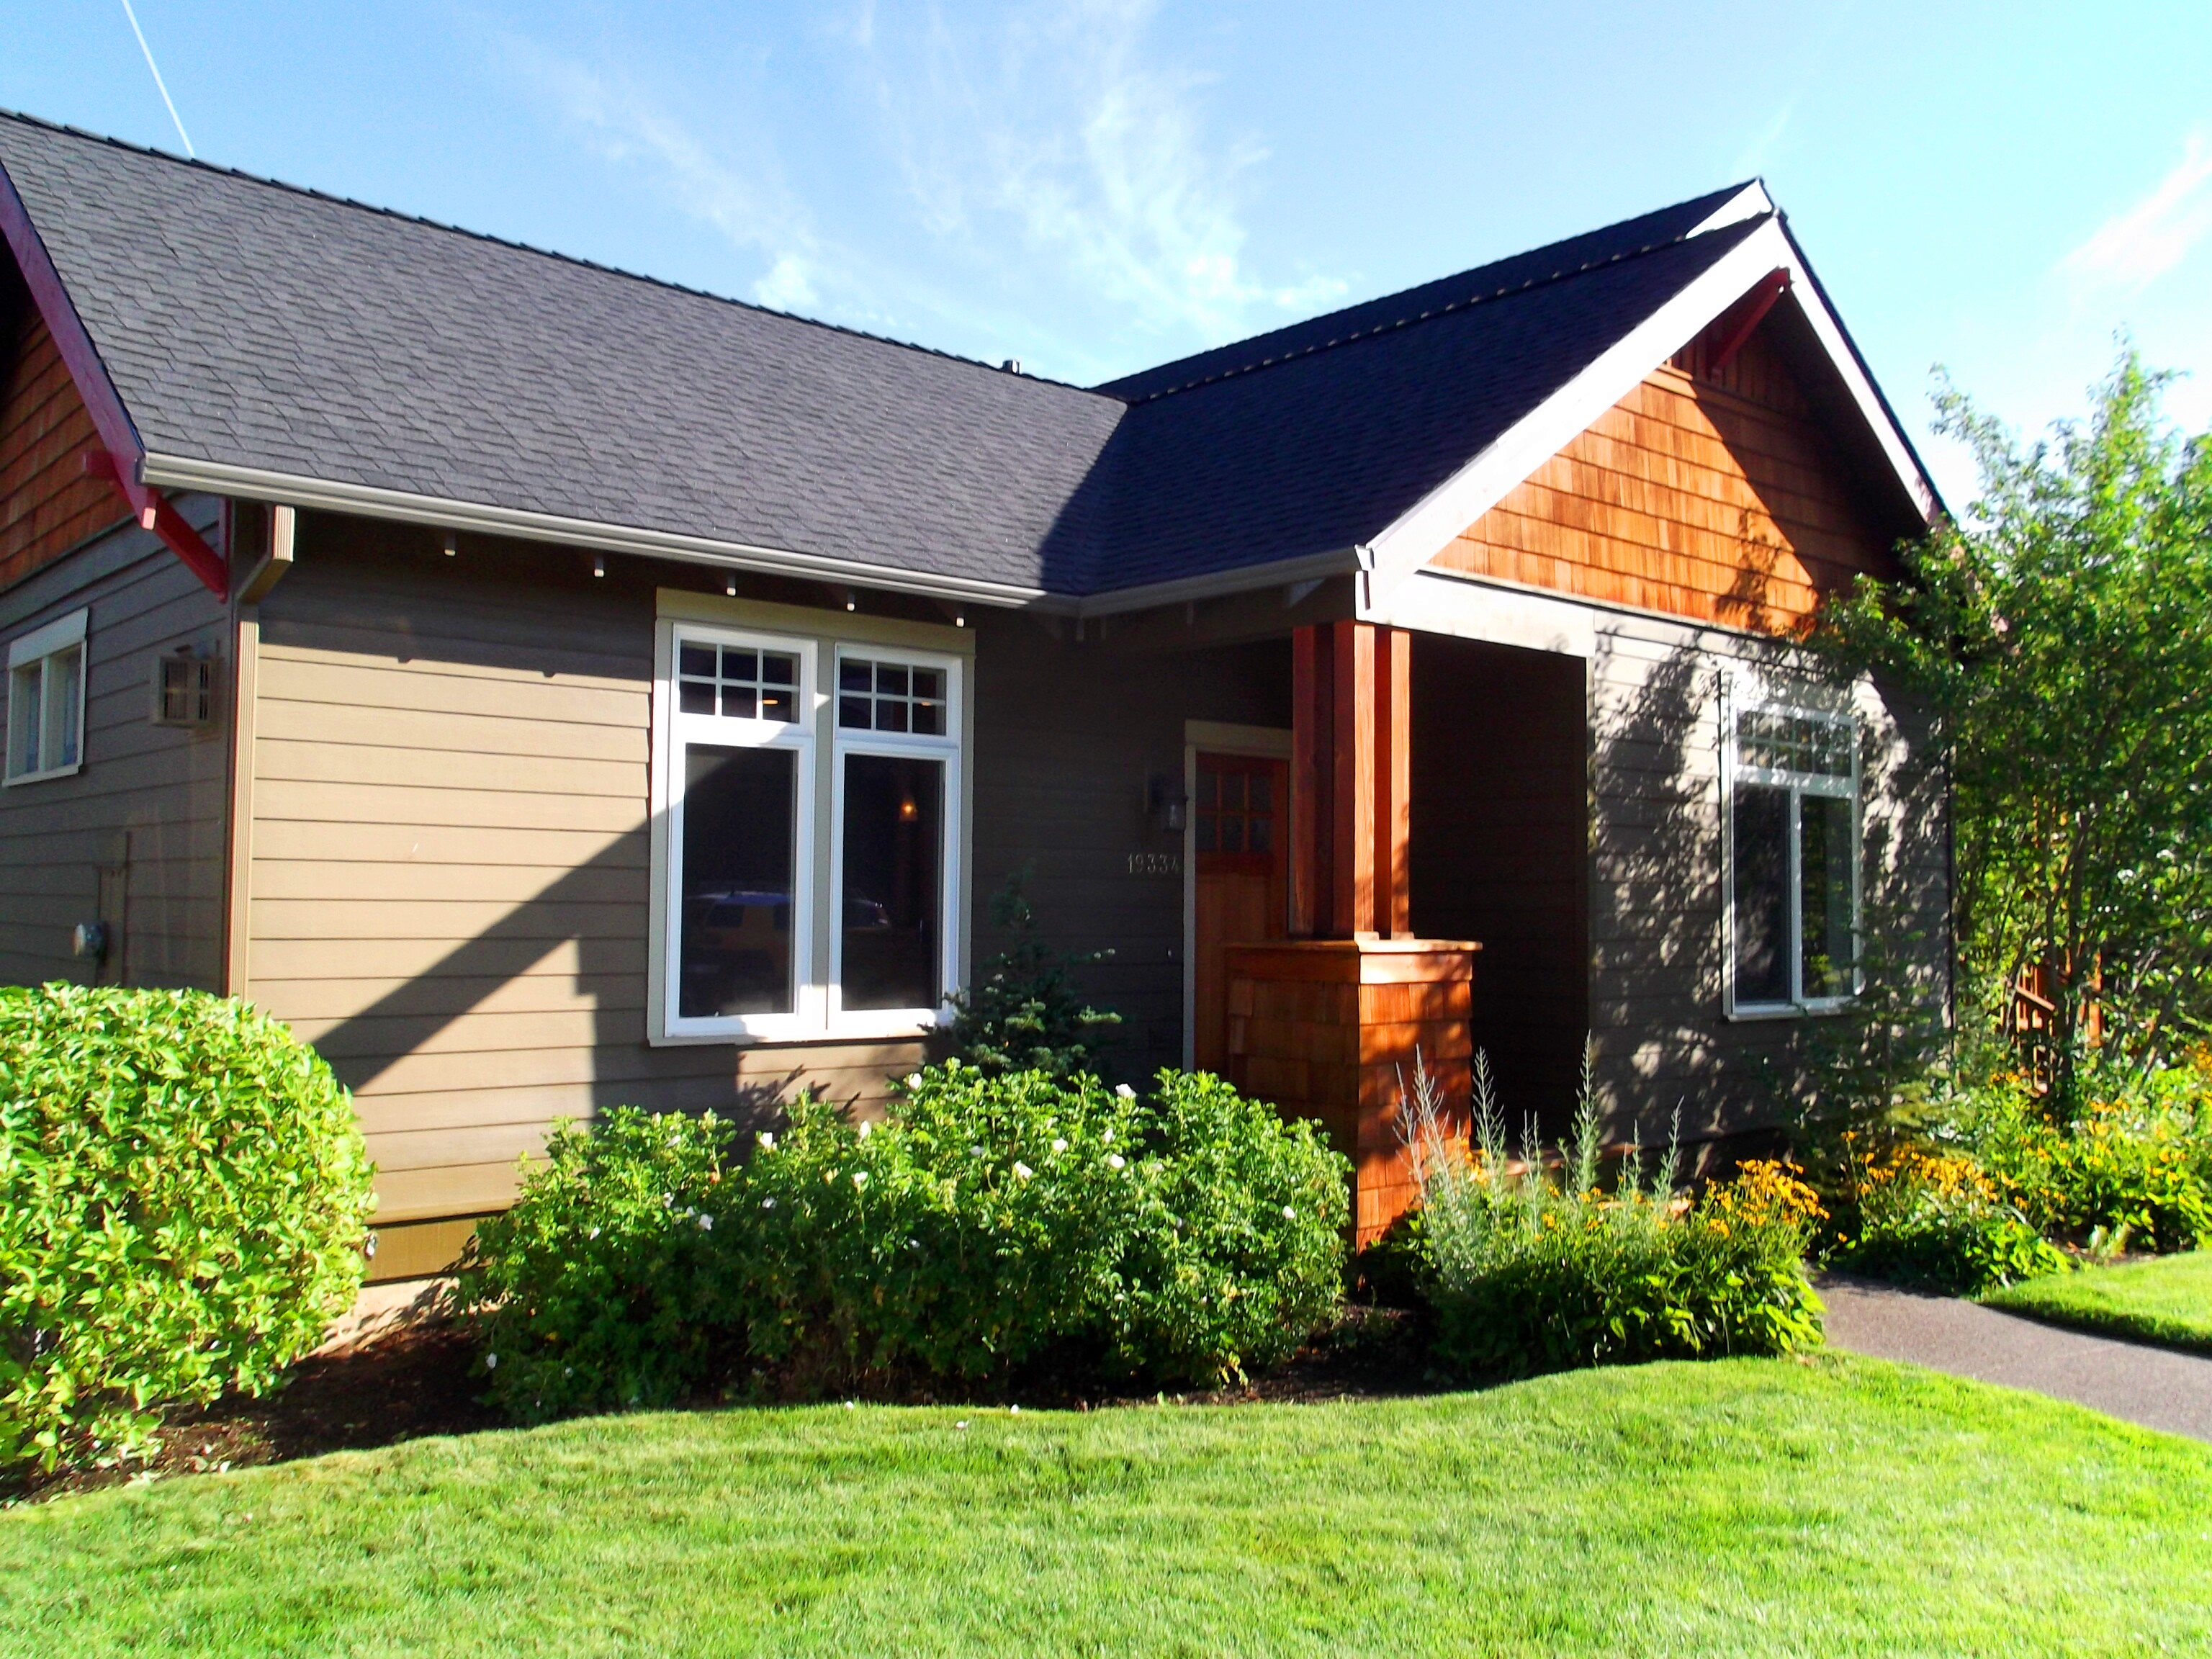 Bend dutch vacation rentals inc bend oregon or for Bend cabin rentals